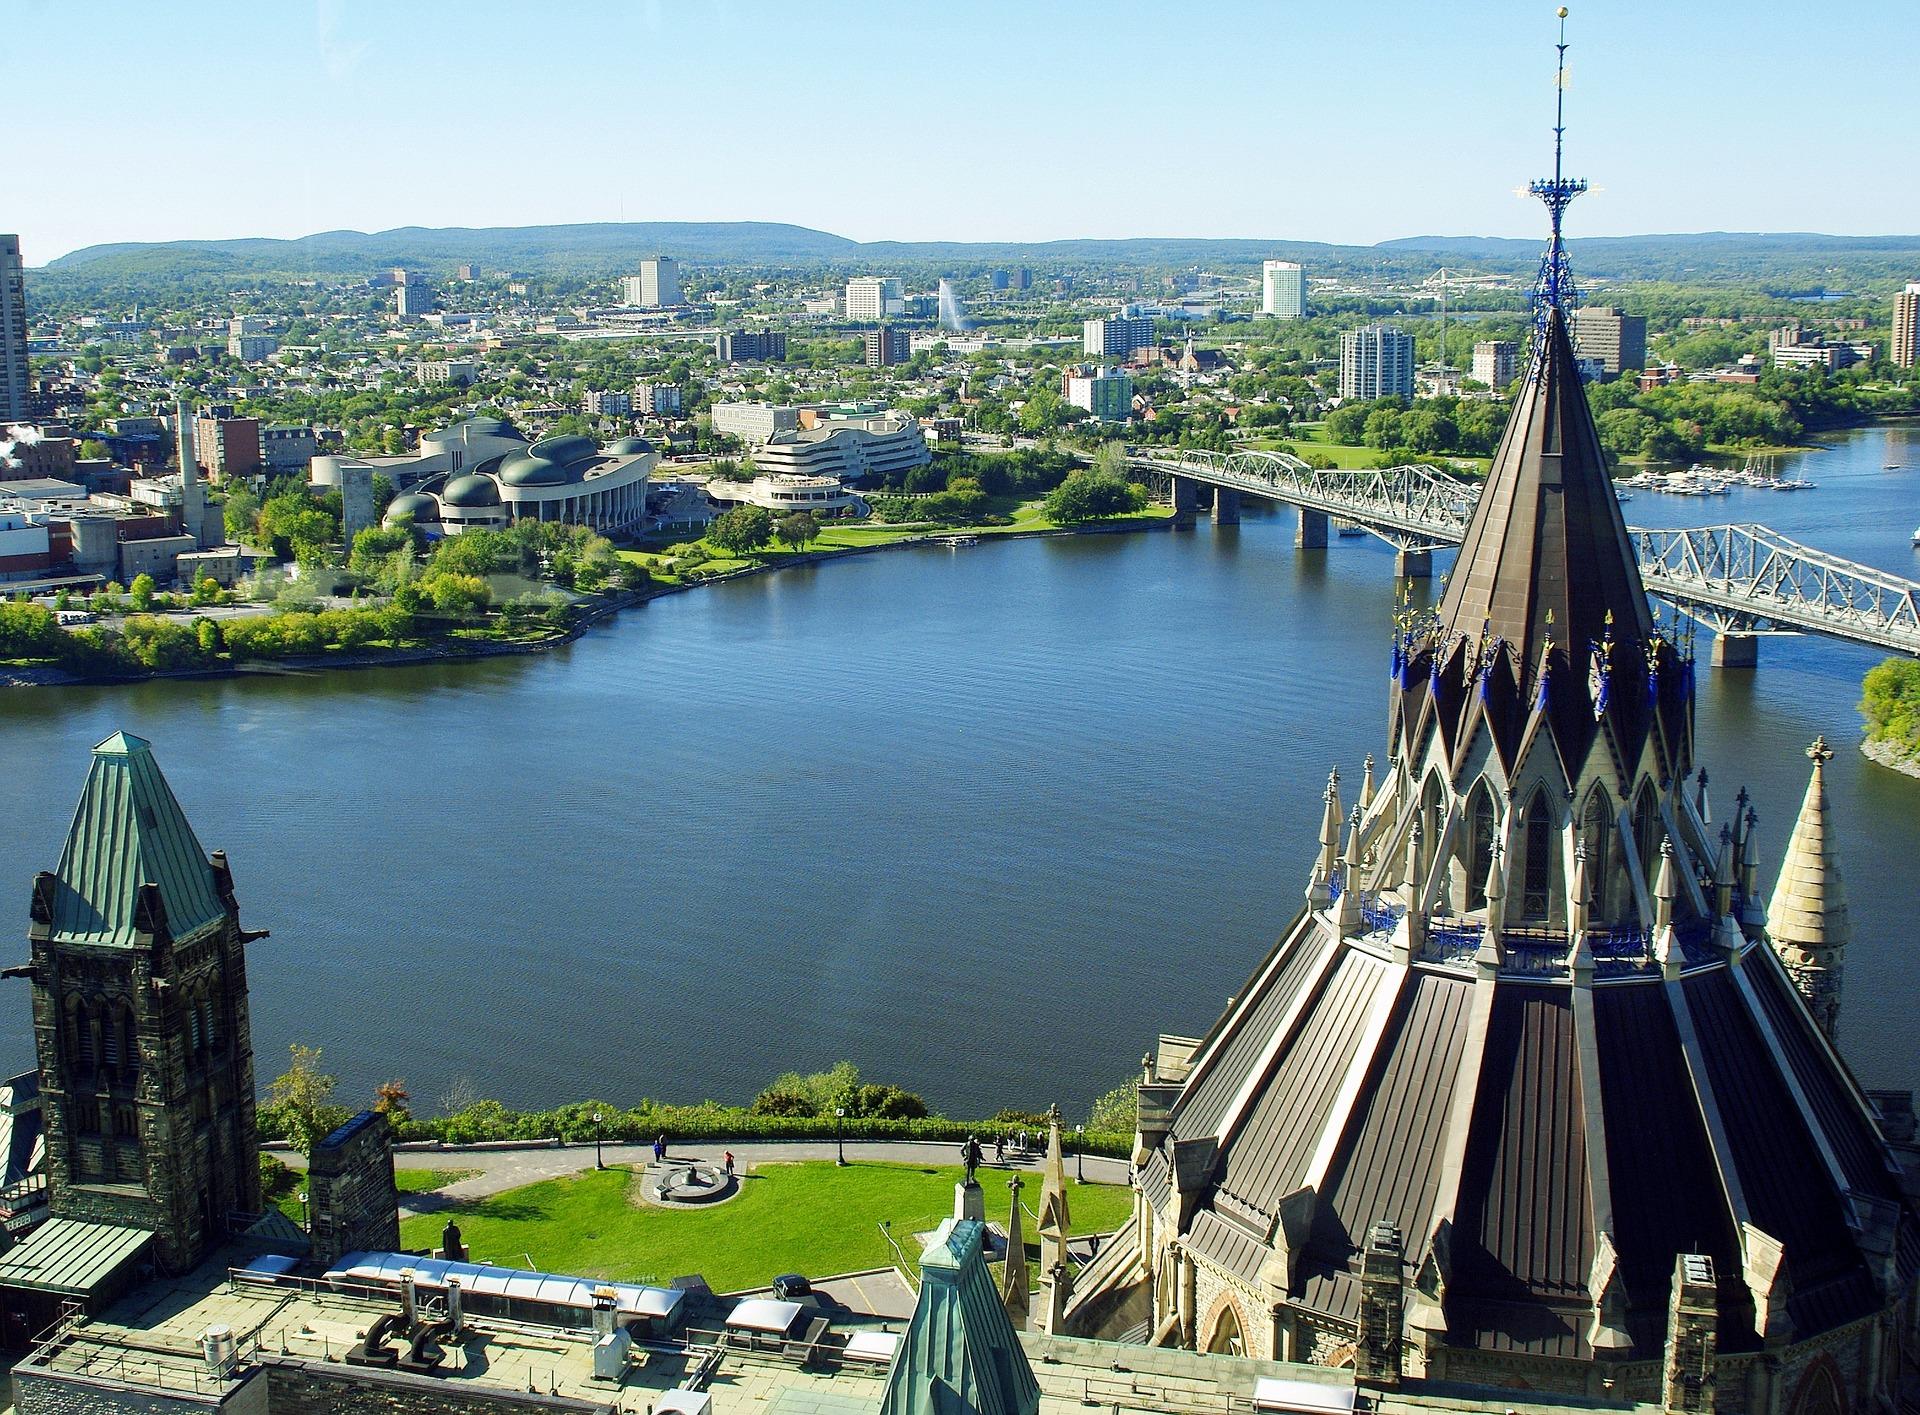 Seguro de viaje internacional para viajar a Ottawa